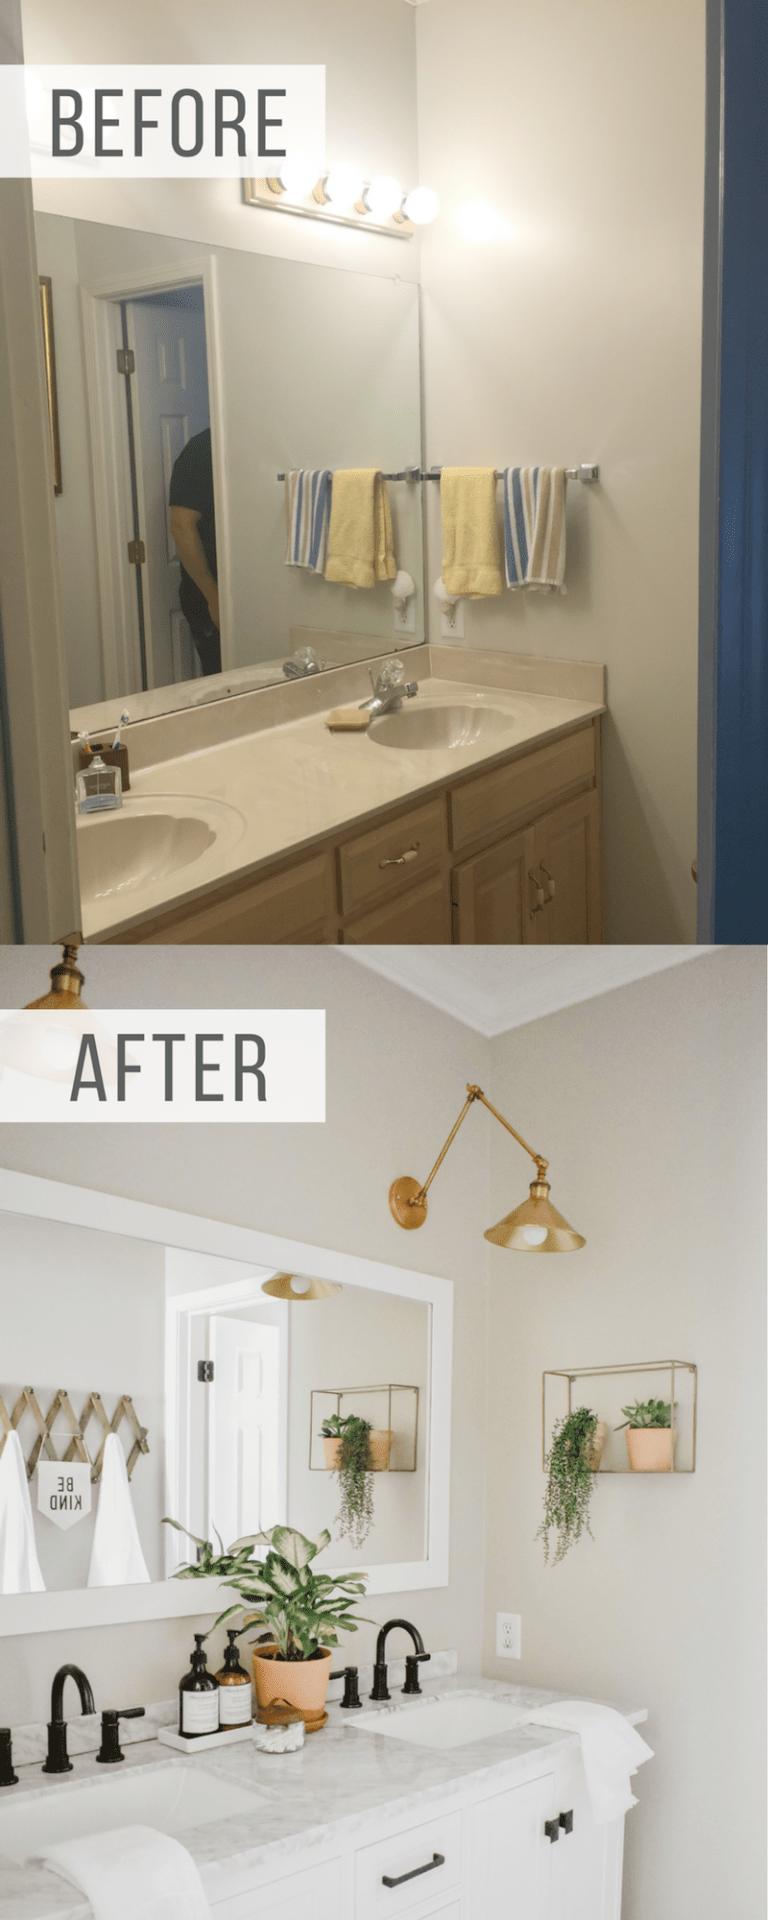 Bathroom Remodel Kansas City Round Bathroom Decor Diy Ideas Per Bathroom Sink Elbow Leaks Other Bathroom Va Upscale Bathroom Modern Boho Bathroom Boho Bathroom [ png ]